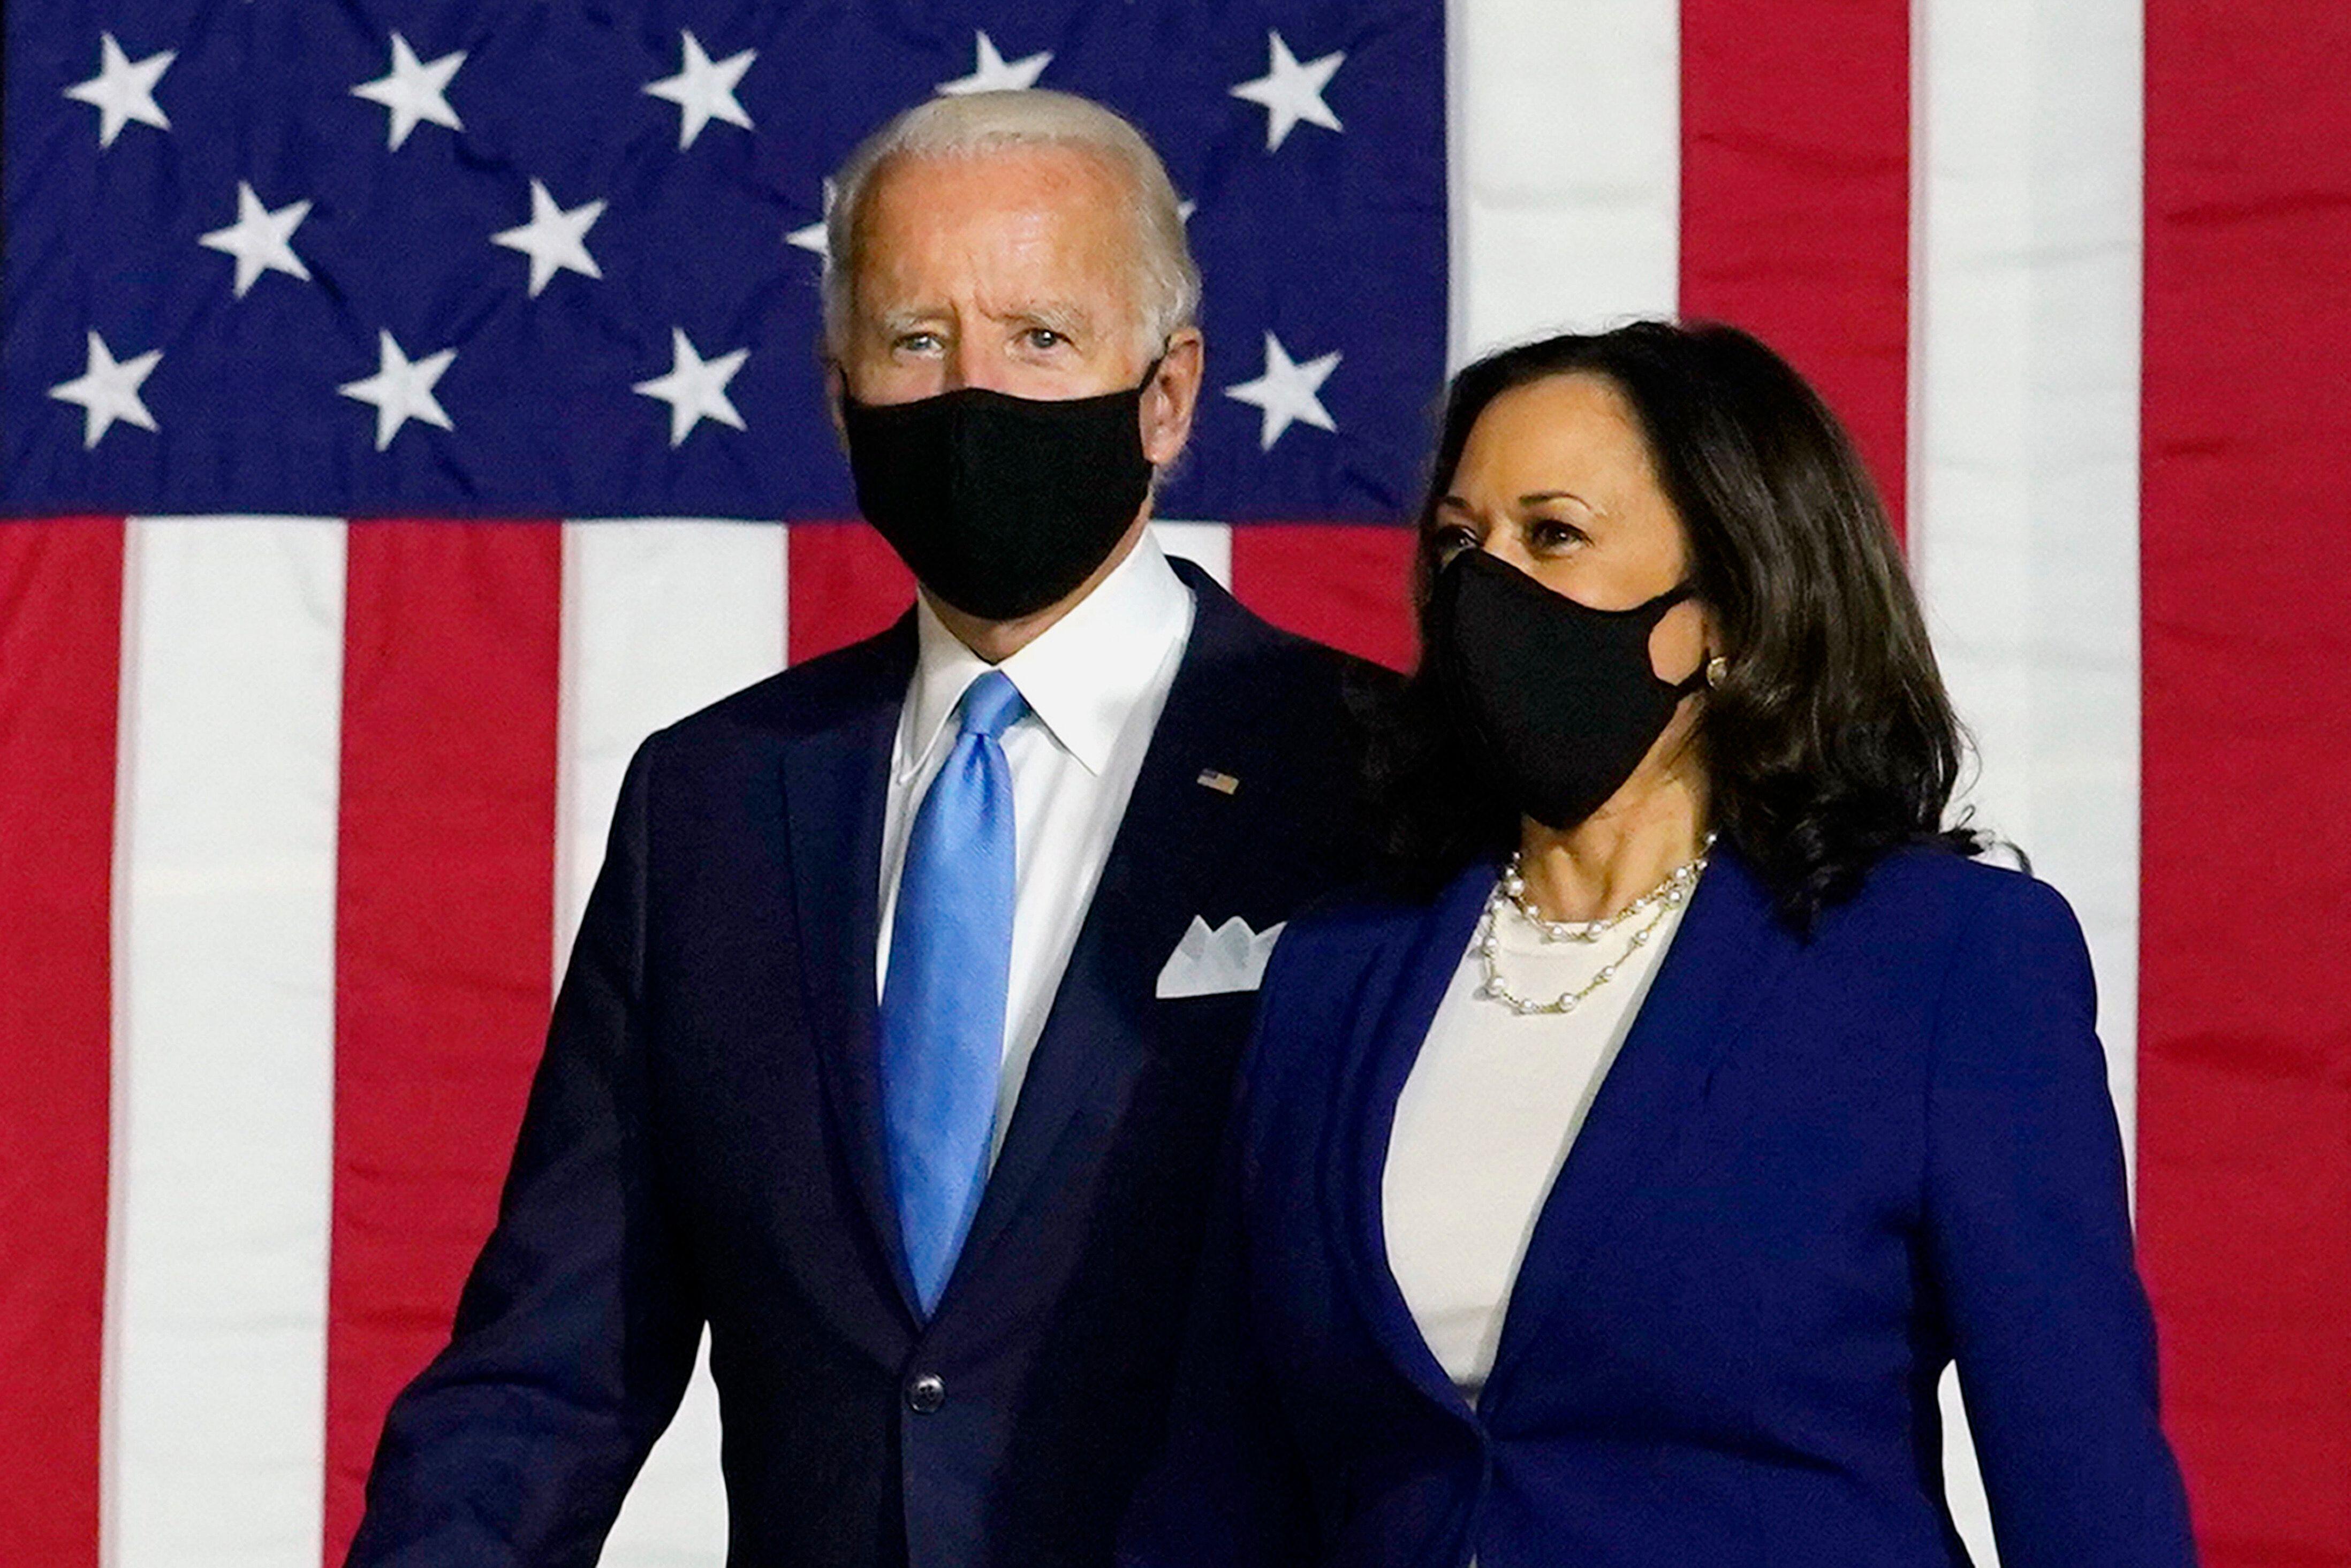 Presumptive Democratic presidential candidate Joe Biden and his running mate Sen. Kamala Harris appear together on Aug. 12 fo